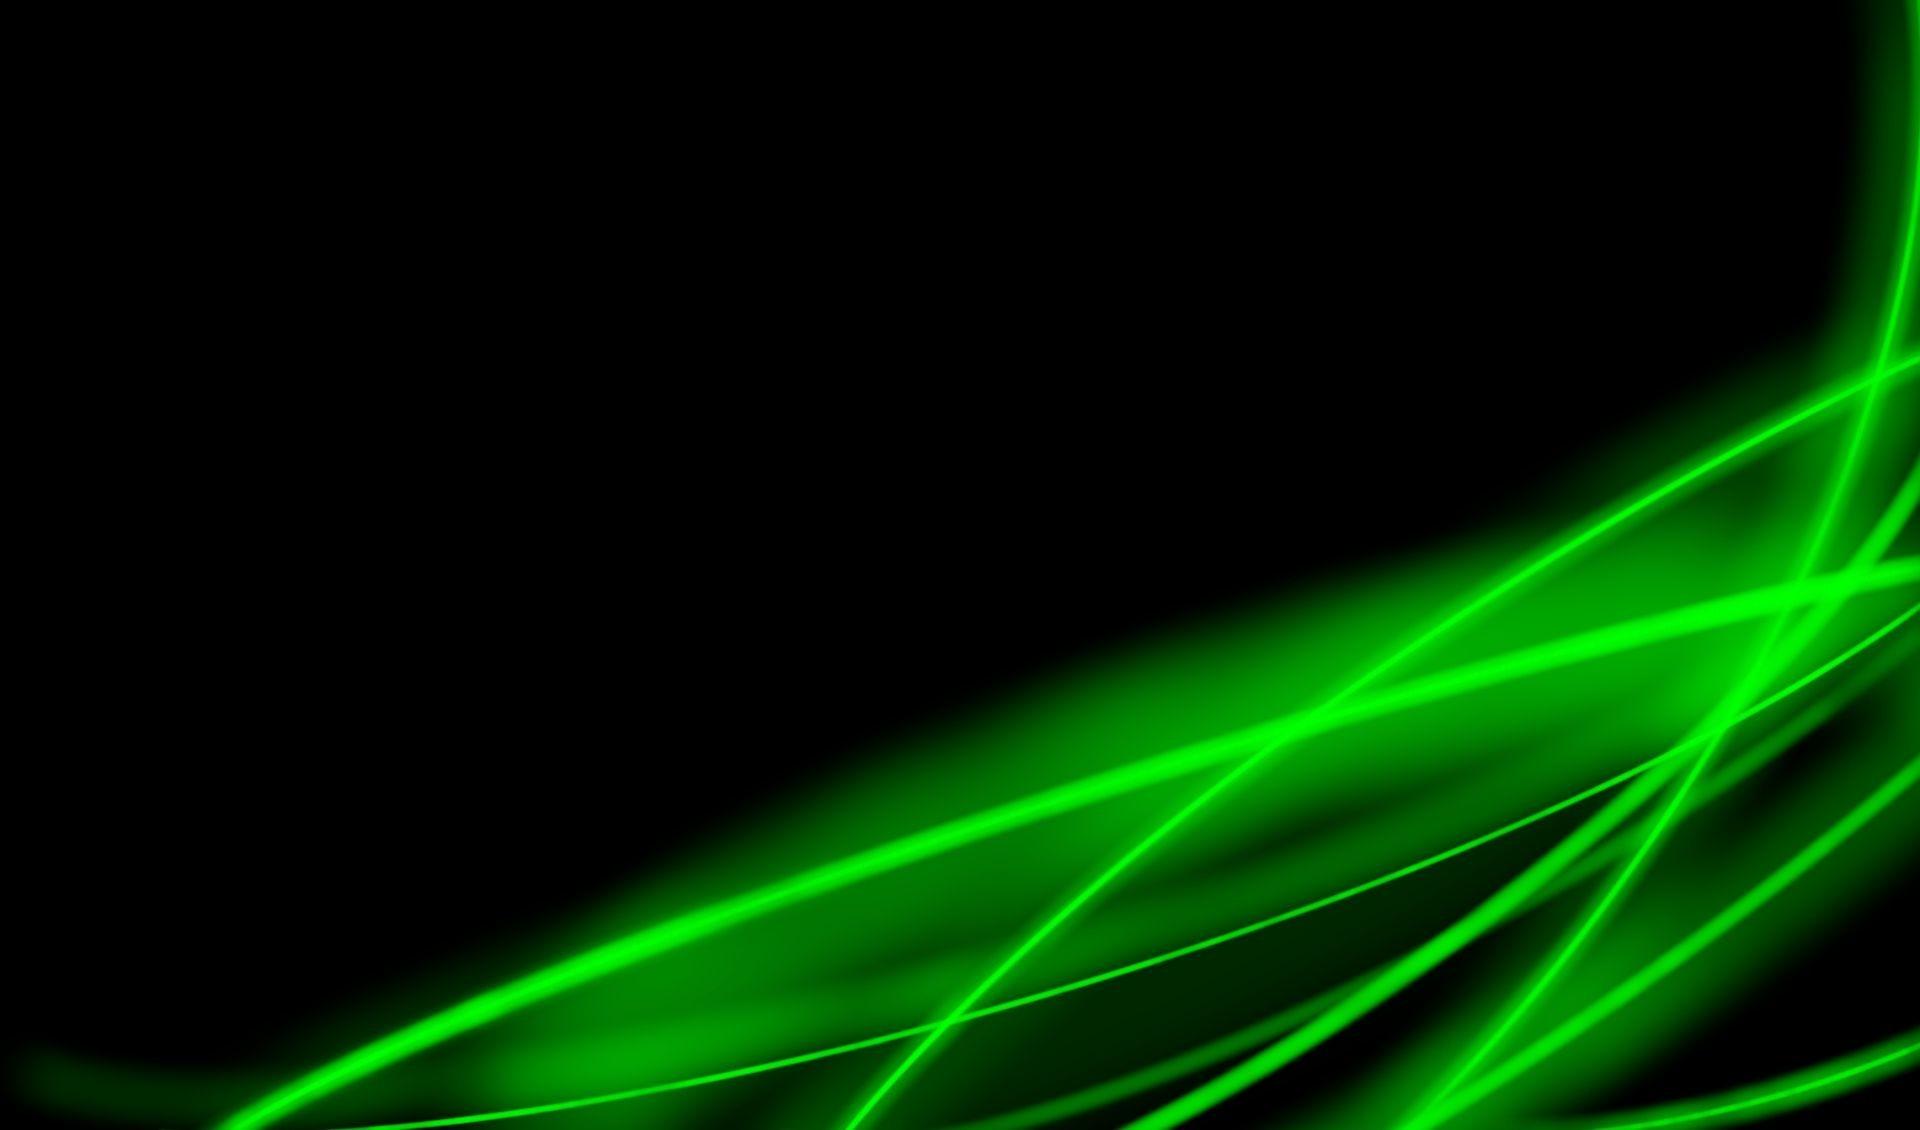 … free download green neon wallpapers wallpapercraft …